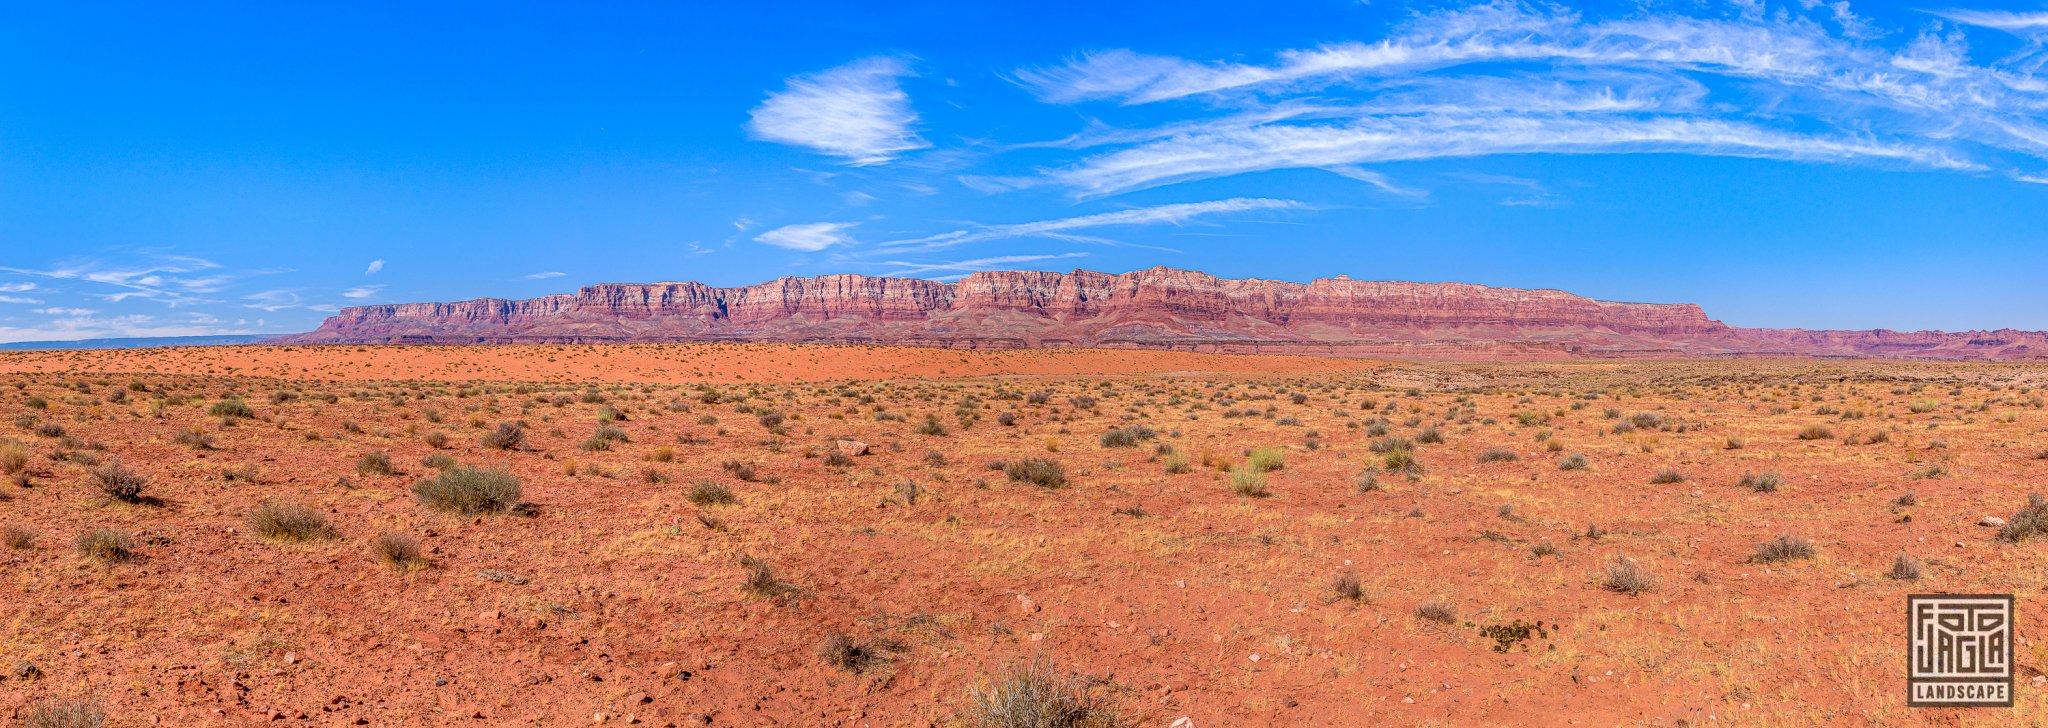 Marble Canyon Arizona, USA 2019